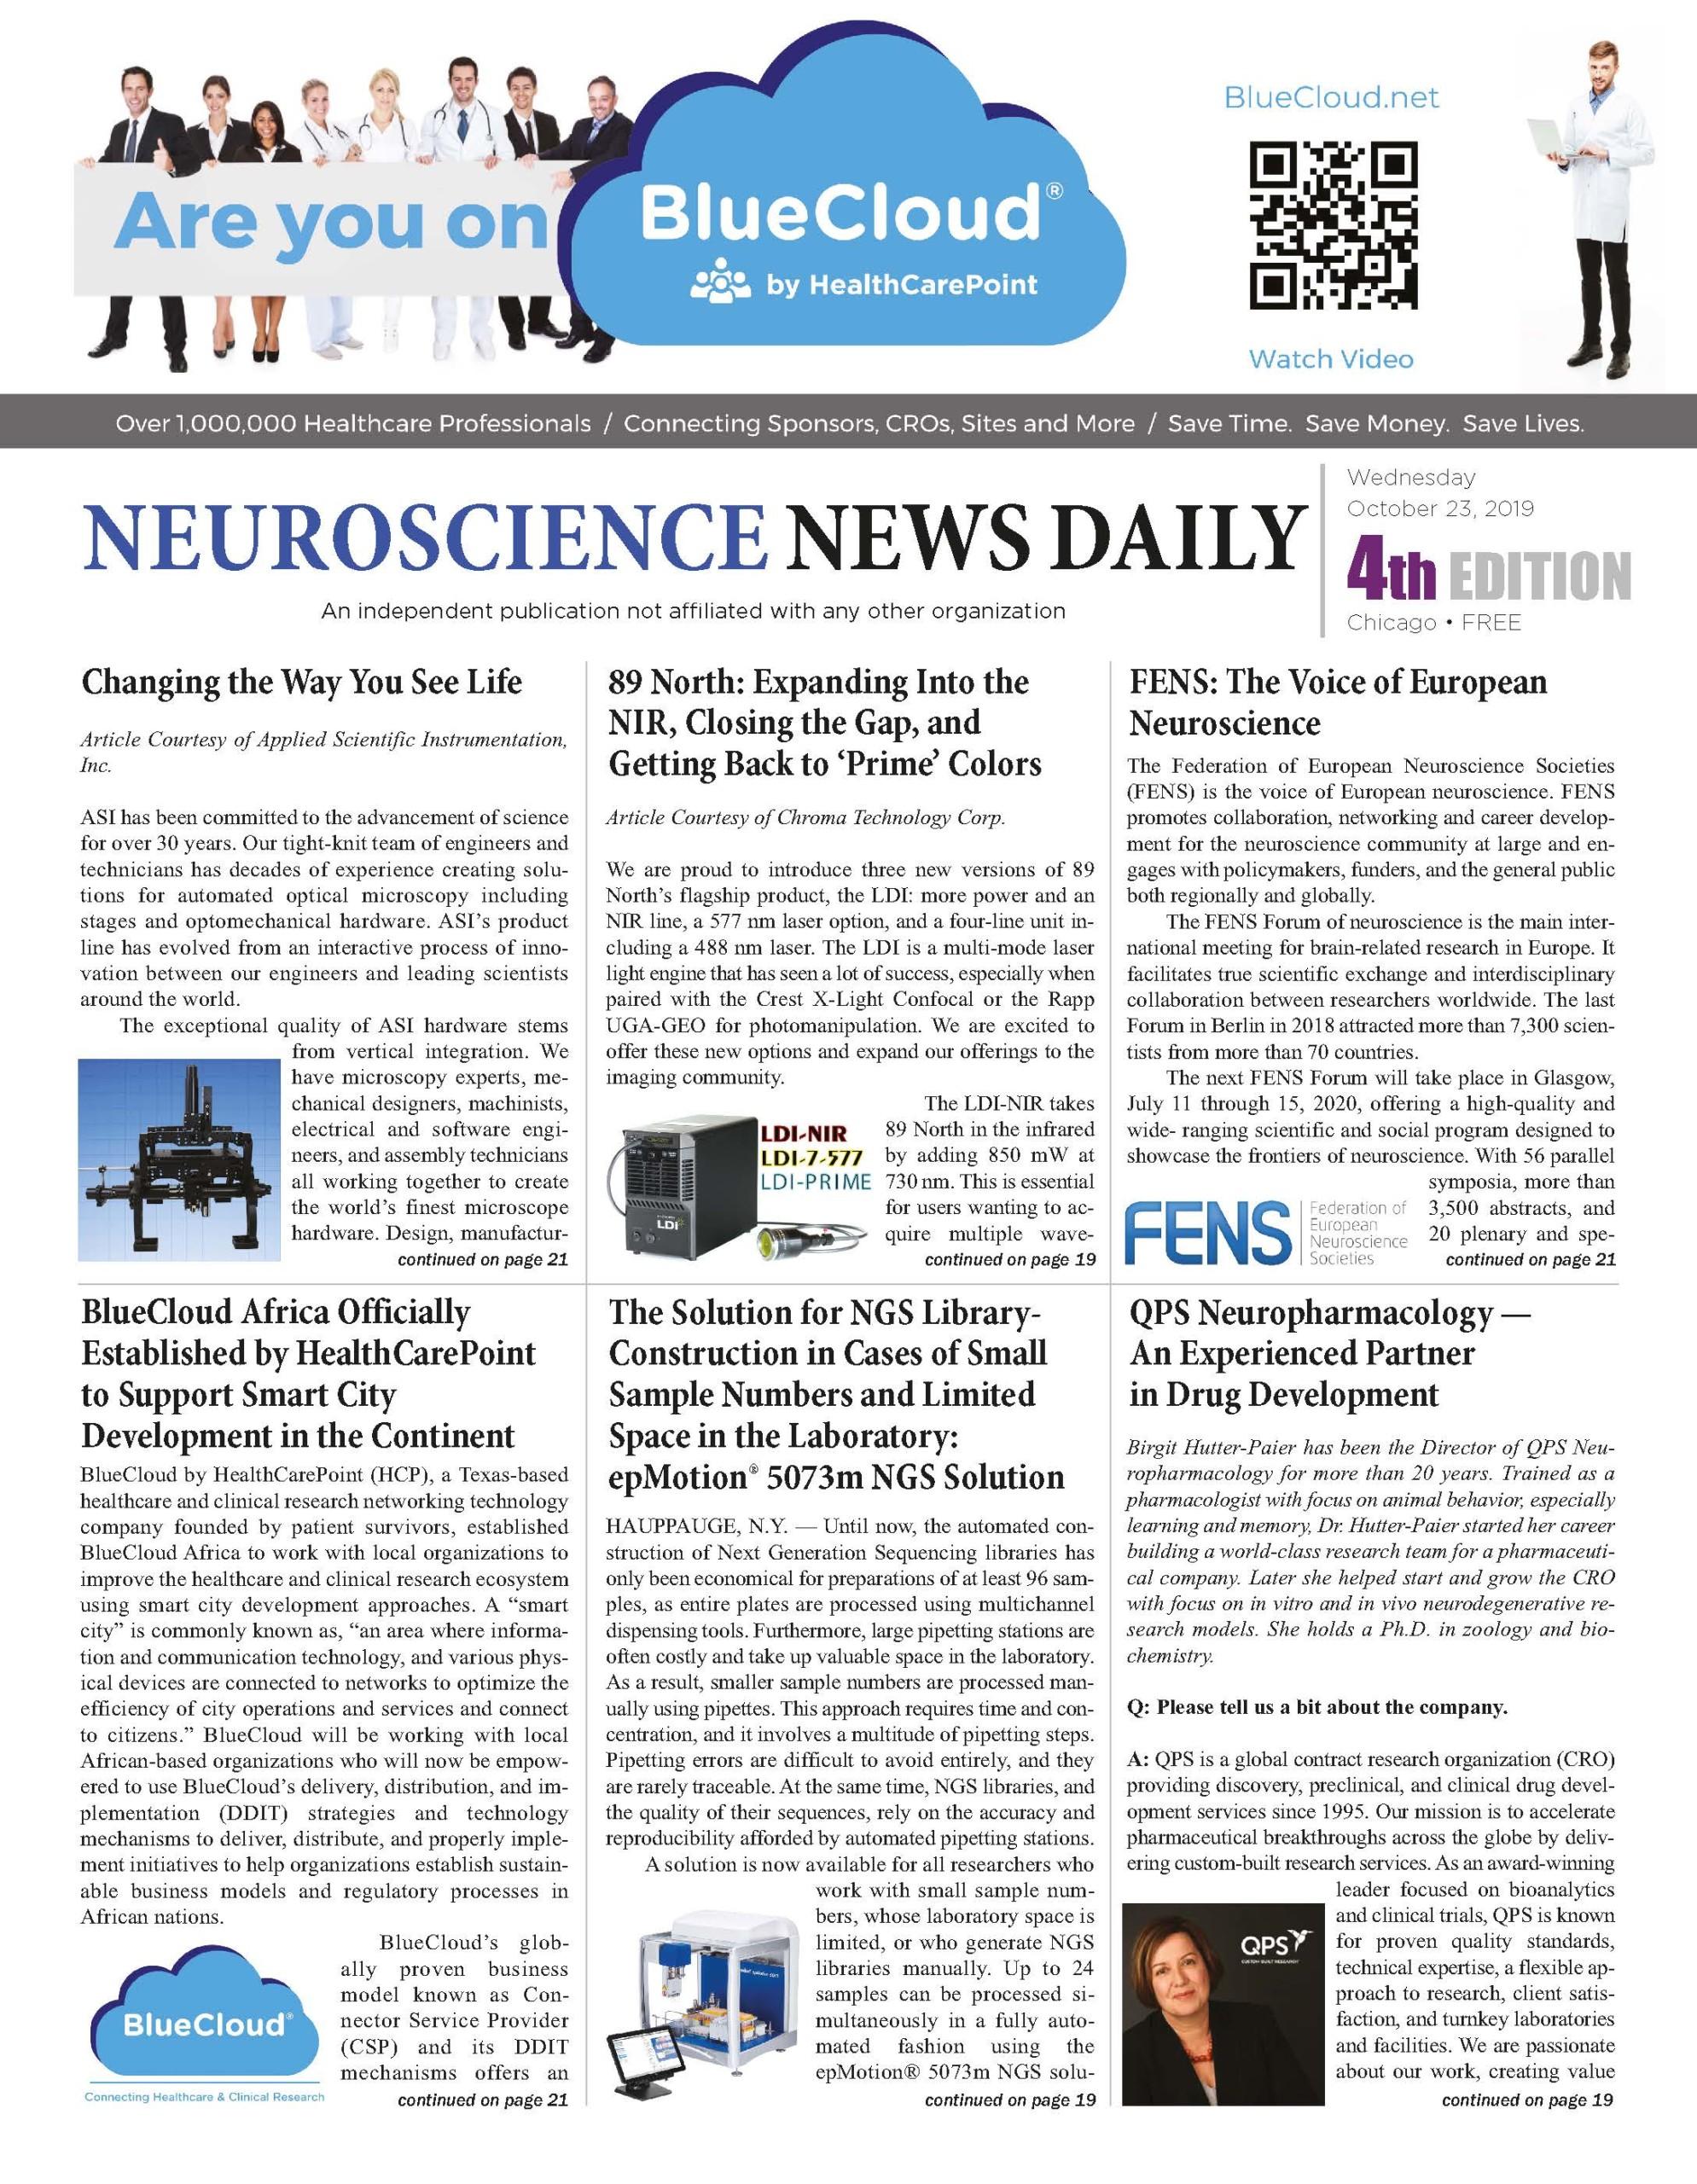 Neuroscience News Daily